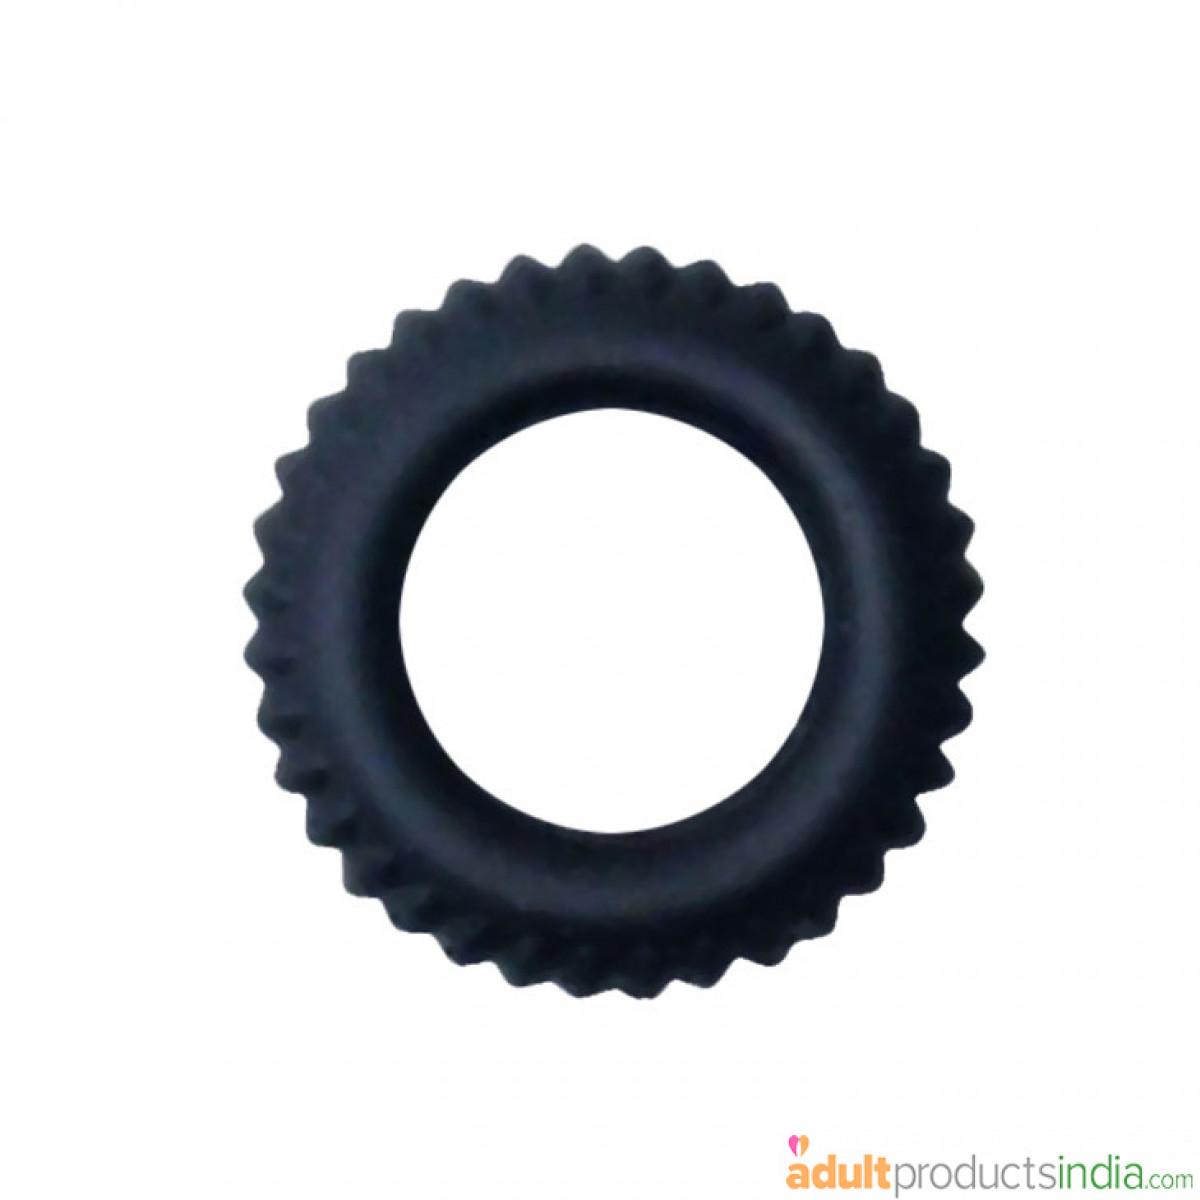 Single Silicone Black Cock Ring